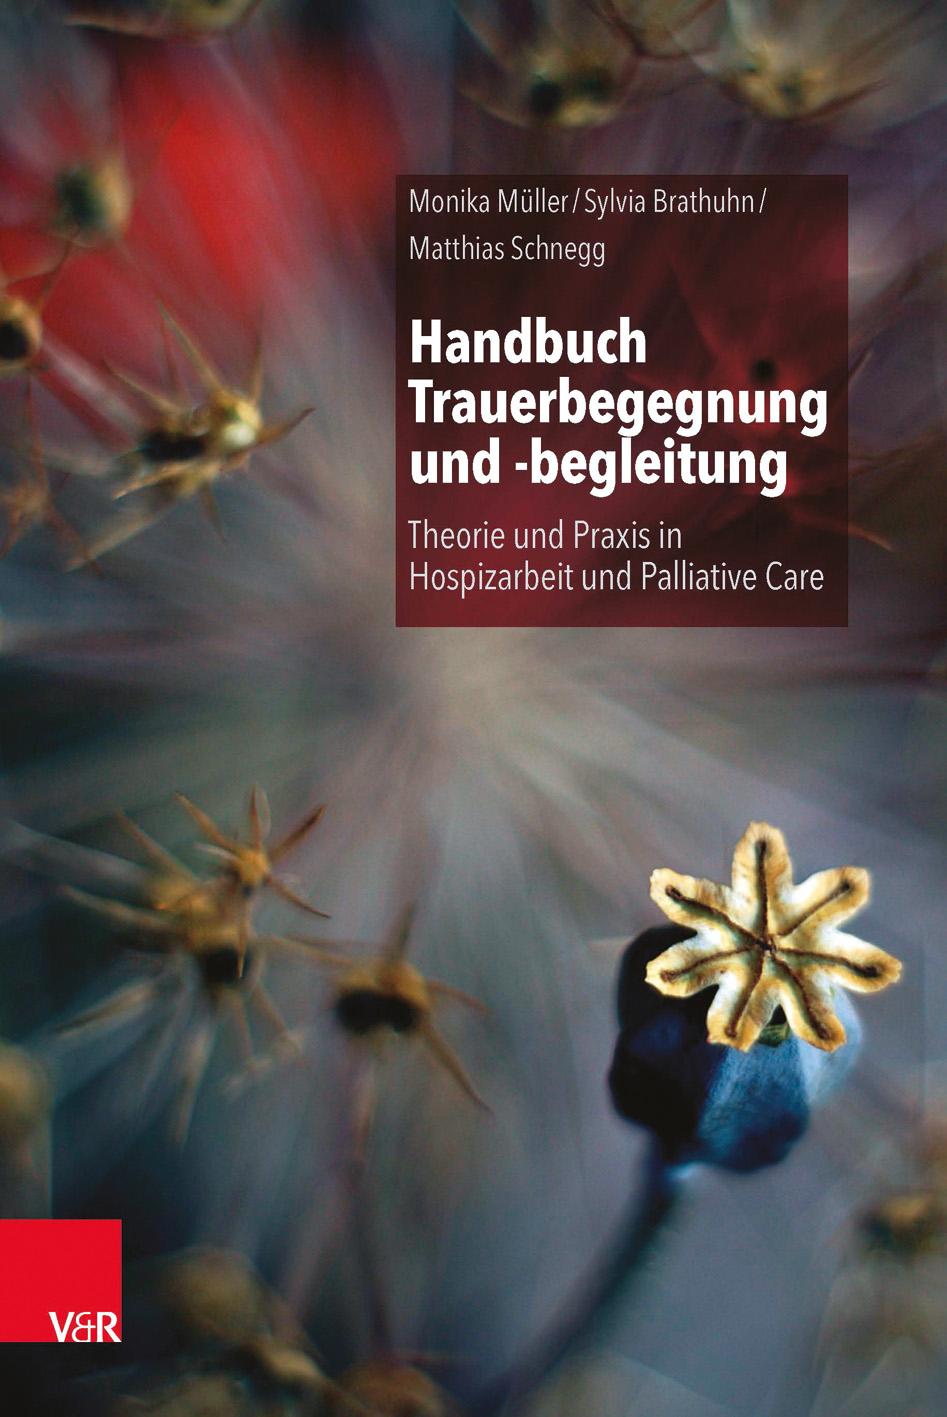 NEU-Handbuch-Trauerbegegnung-und-begleitung-Sylvia-Brathuhn-451885